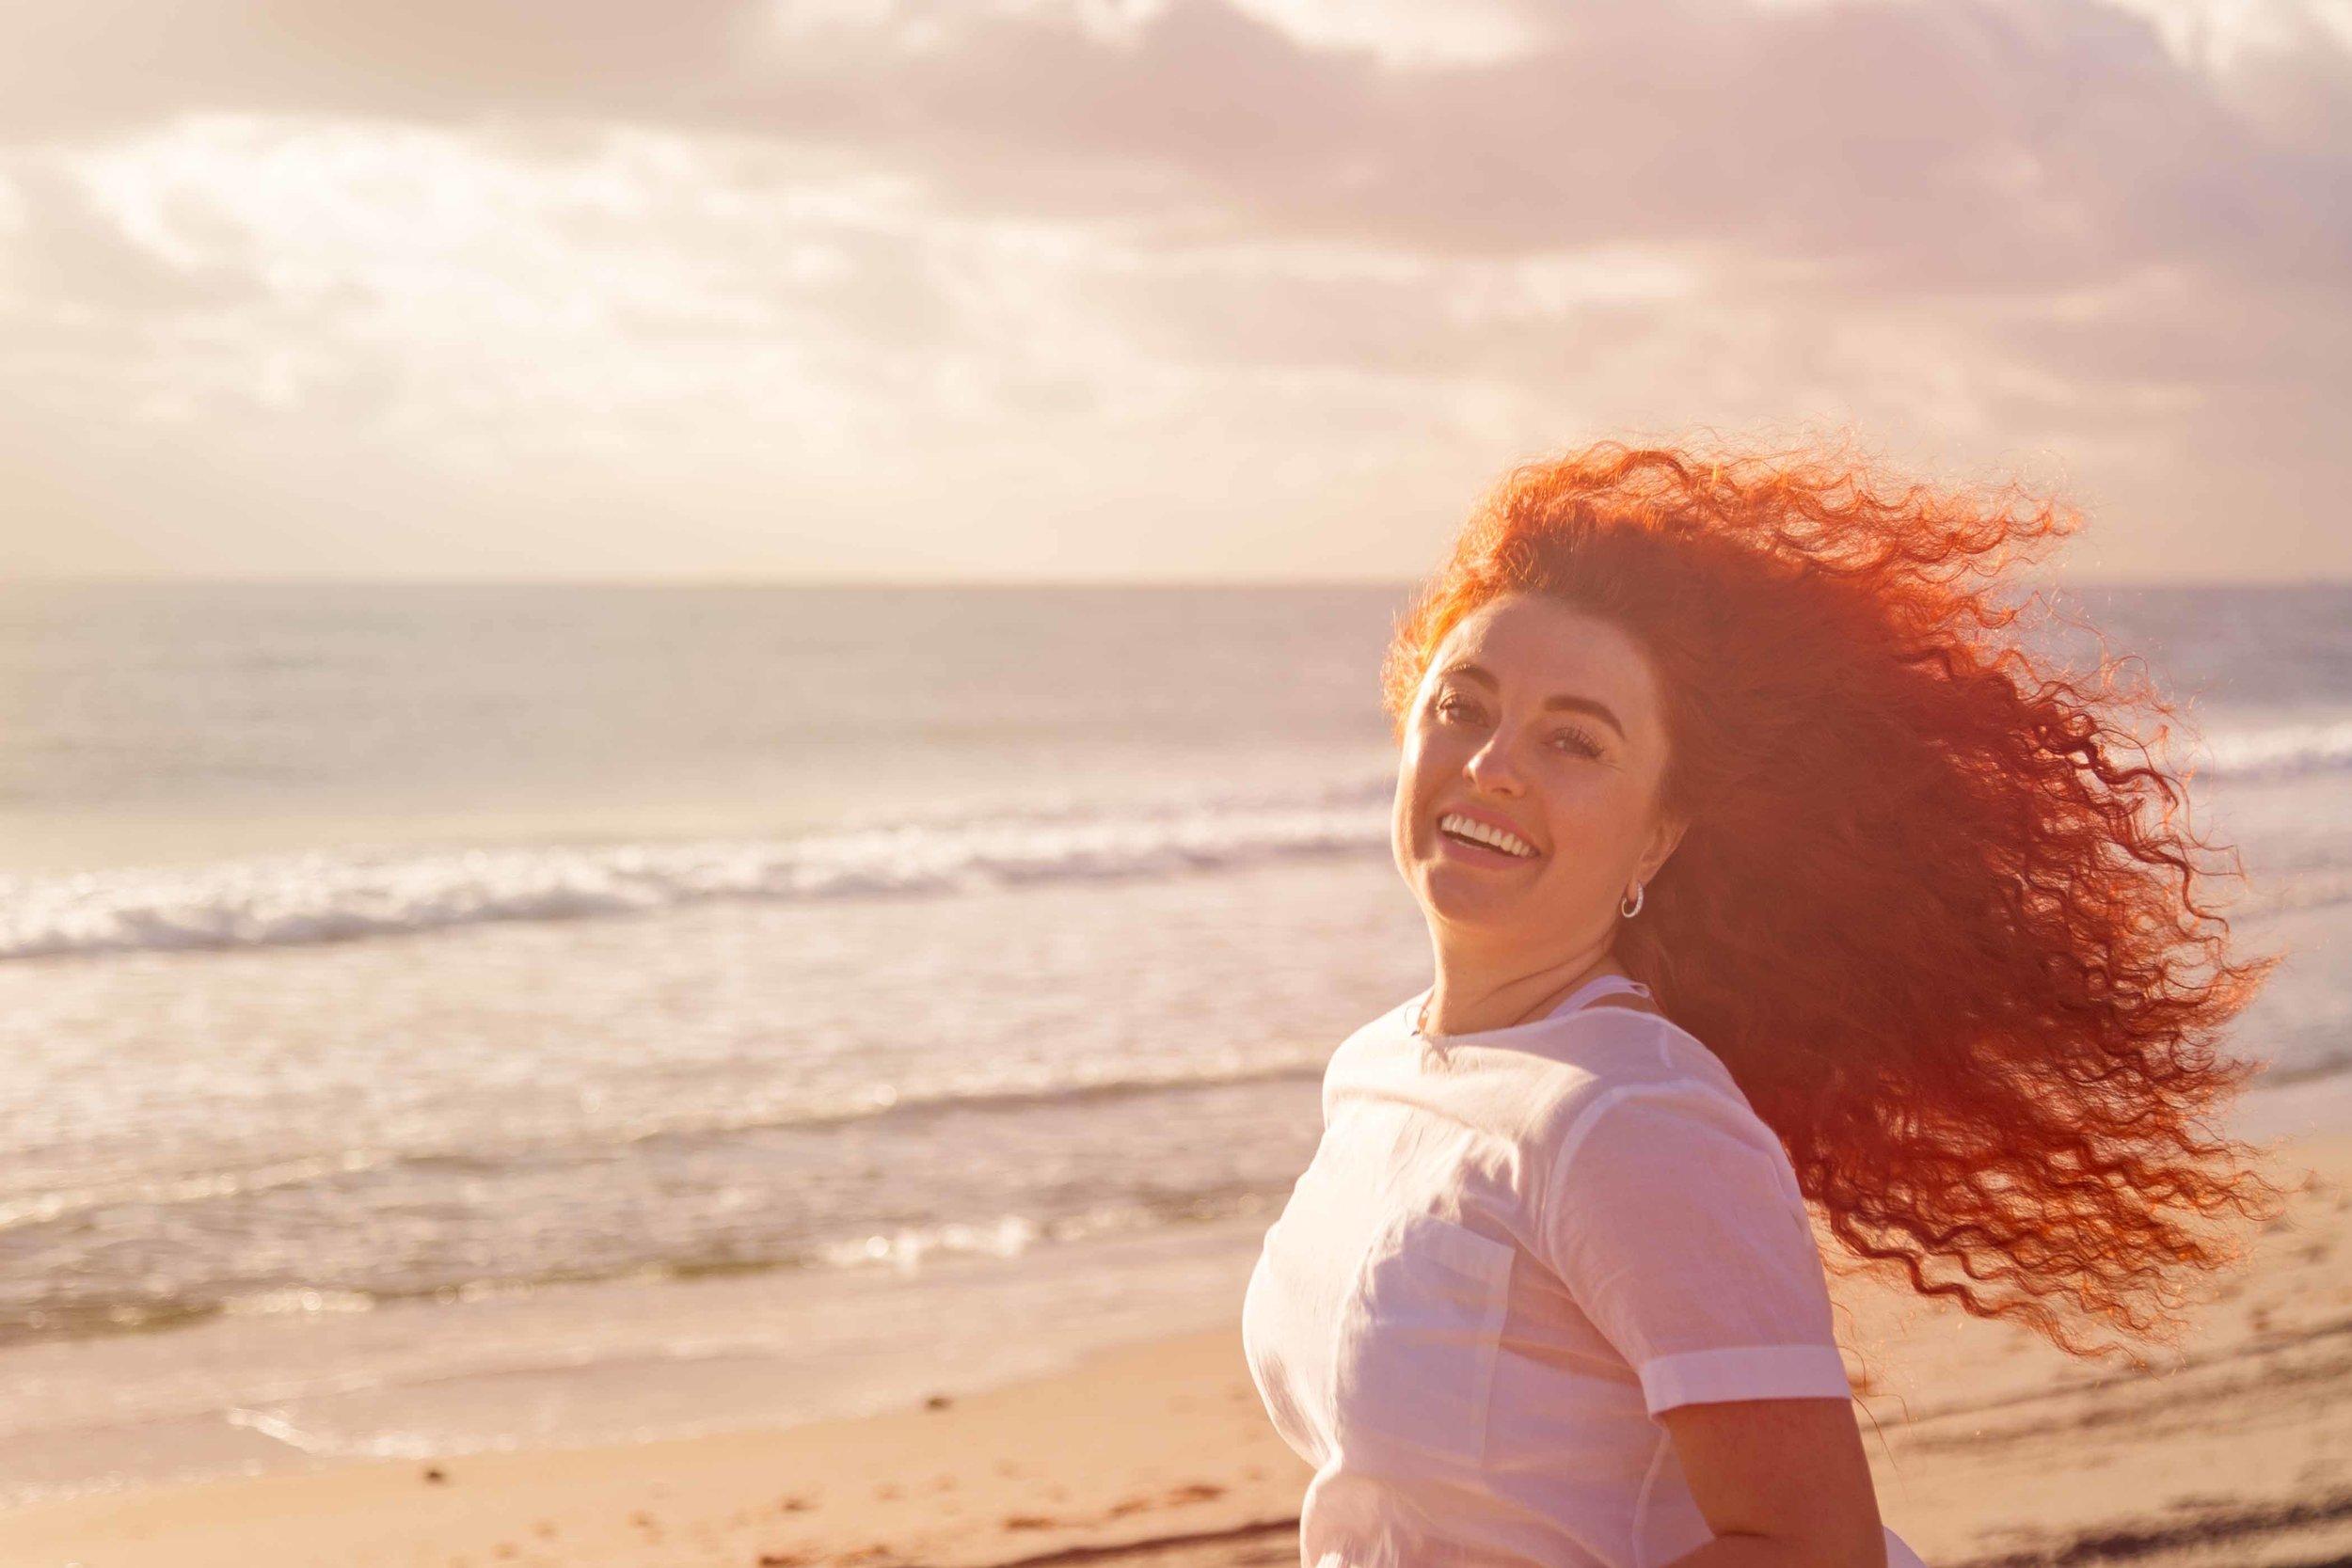 personal-branding-photography-female-entrepreneur-ocean-photoshoot-boca-raton-south-florida